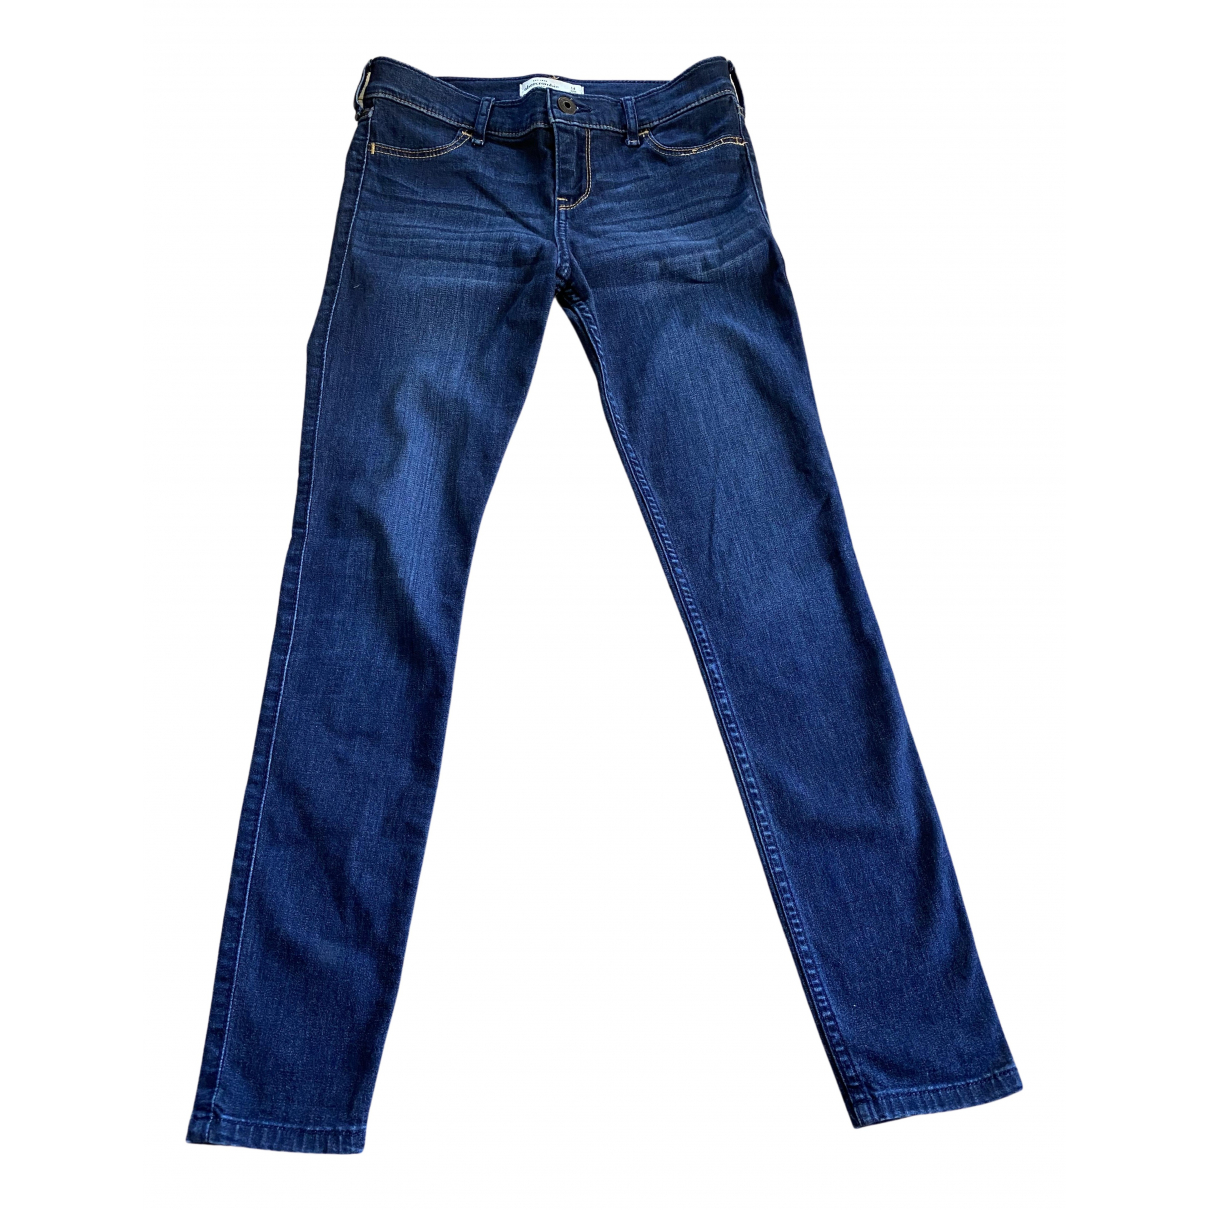 Abercrombie & Fitch - Pantalon   pour enfant en denim - bleu